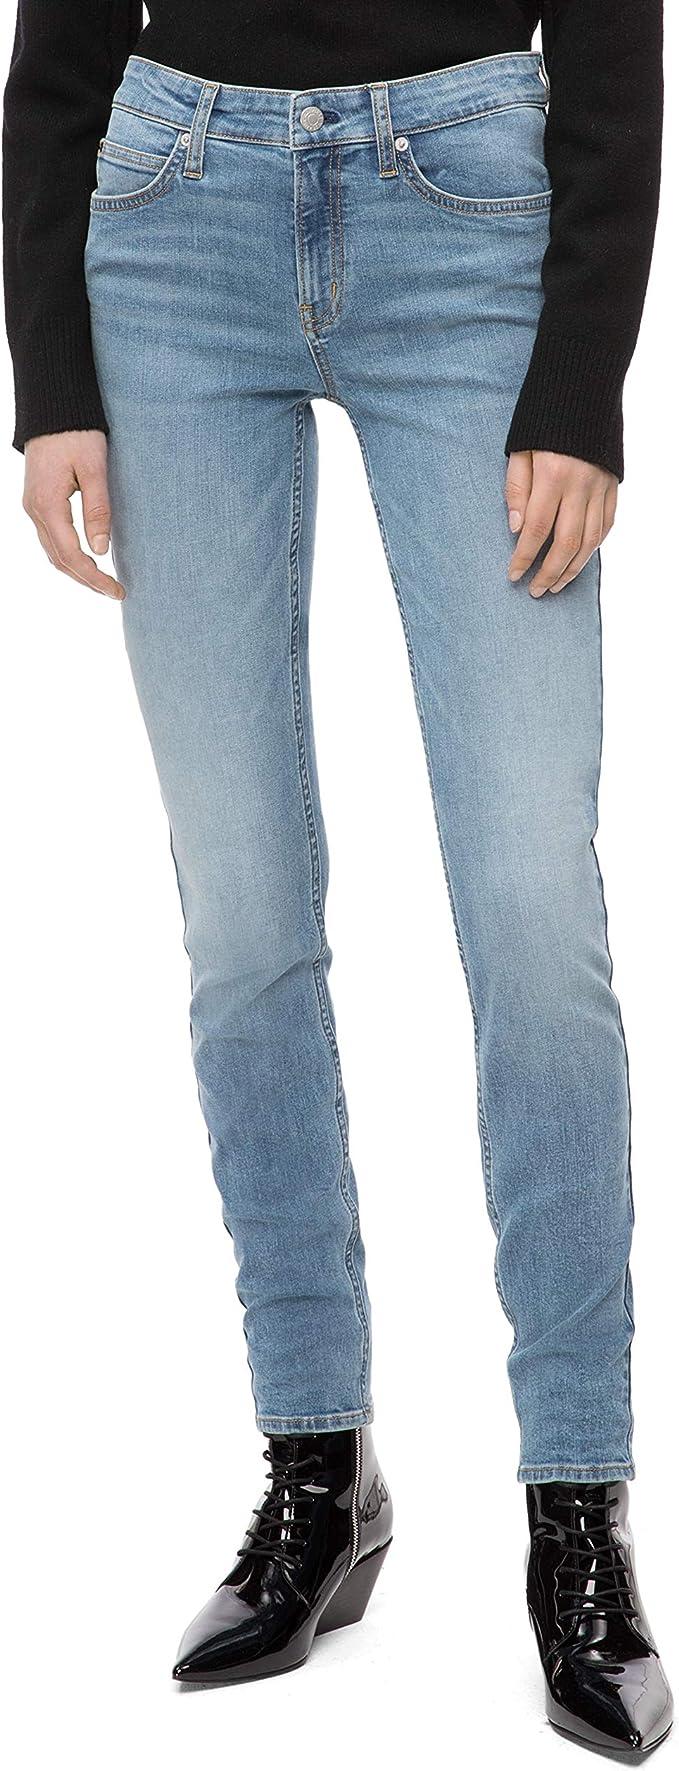 Calvin Klein 卡尔文克莱因 CK 中腰 女式紧身牛仔裤 28W*28L码 3.1折$21.88 海淘转运到手约¥193